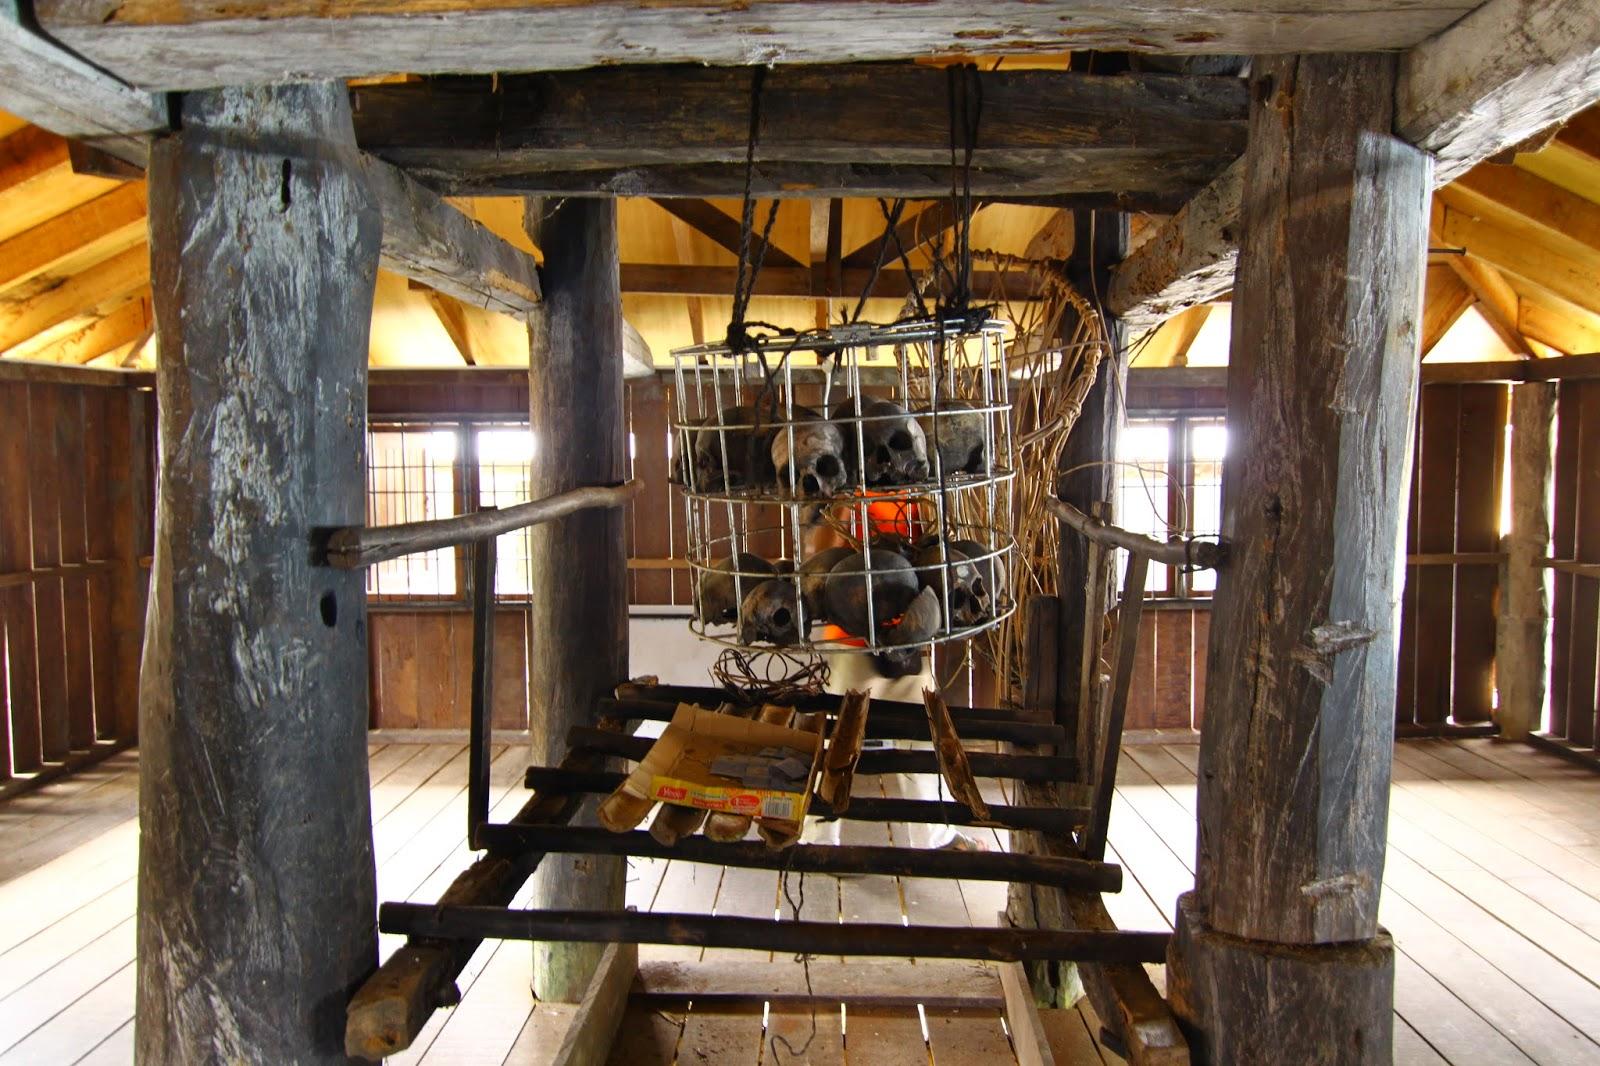 Barok tempat khas simpan tengkorak kepala yang dipenggal